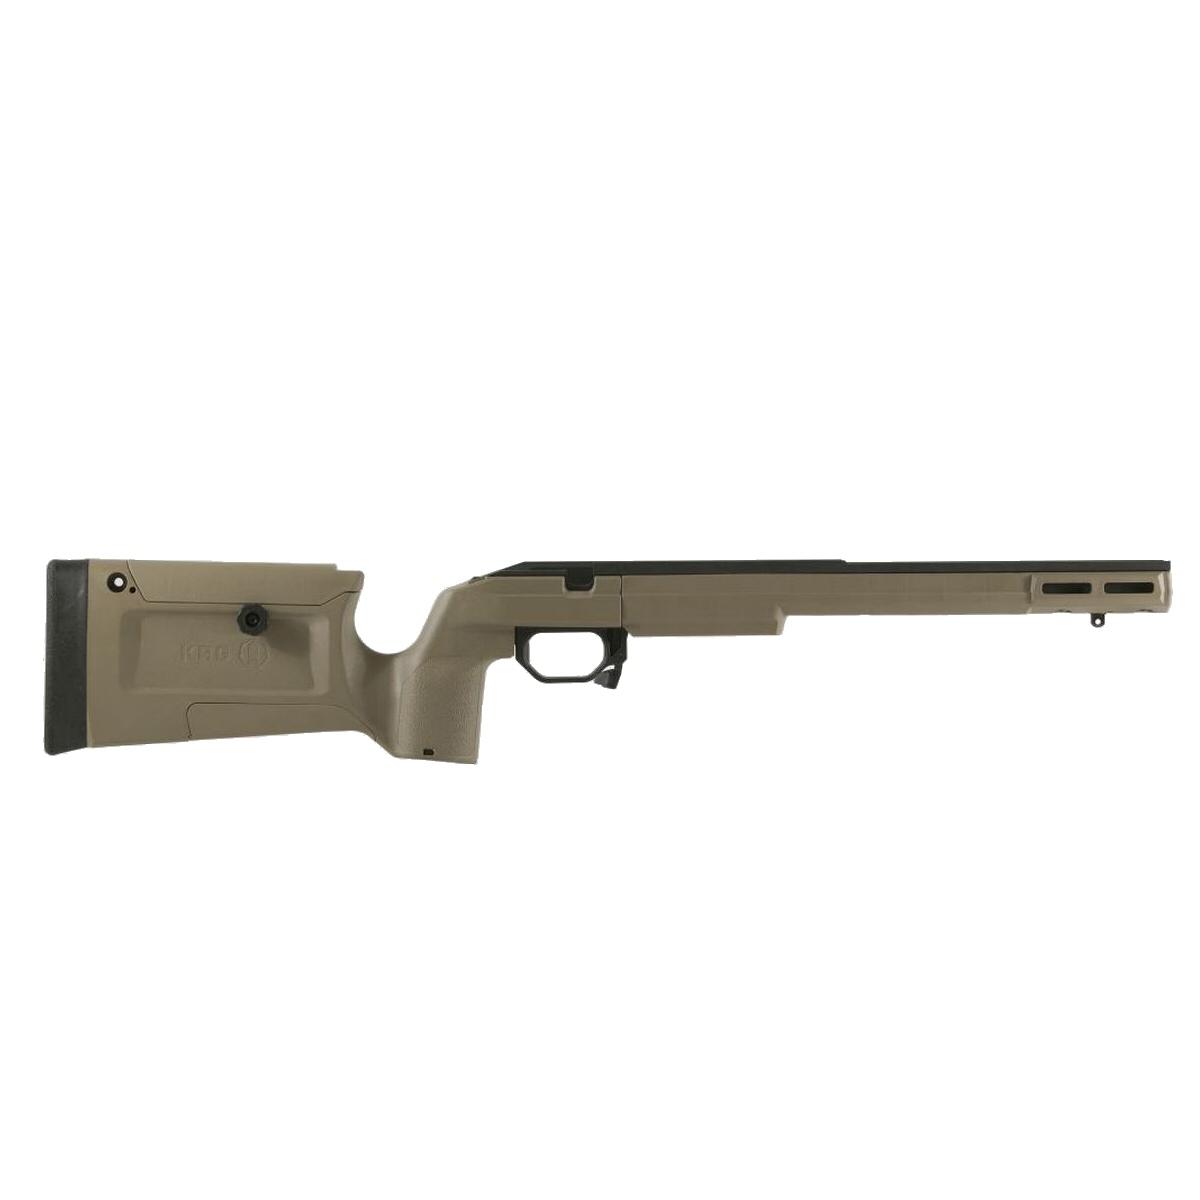 KRG Bravo Rifle Chassis CZ 457 Rimfire FDE